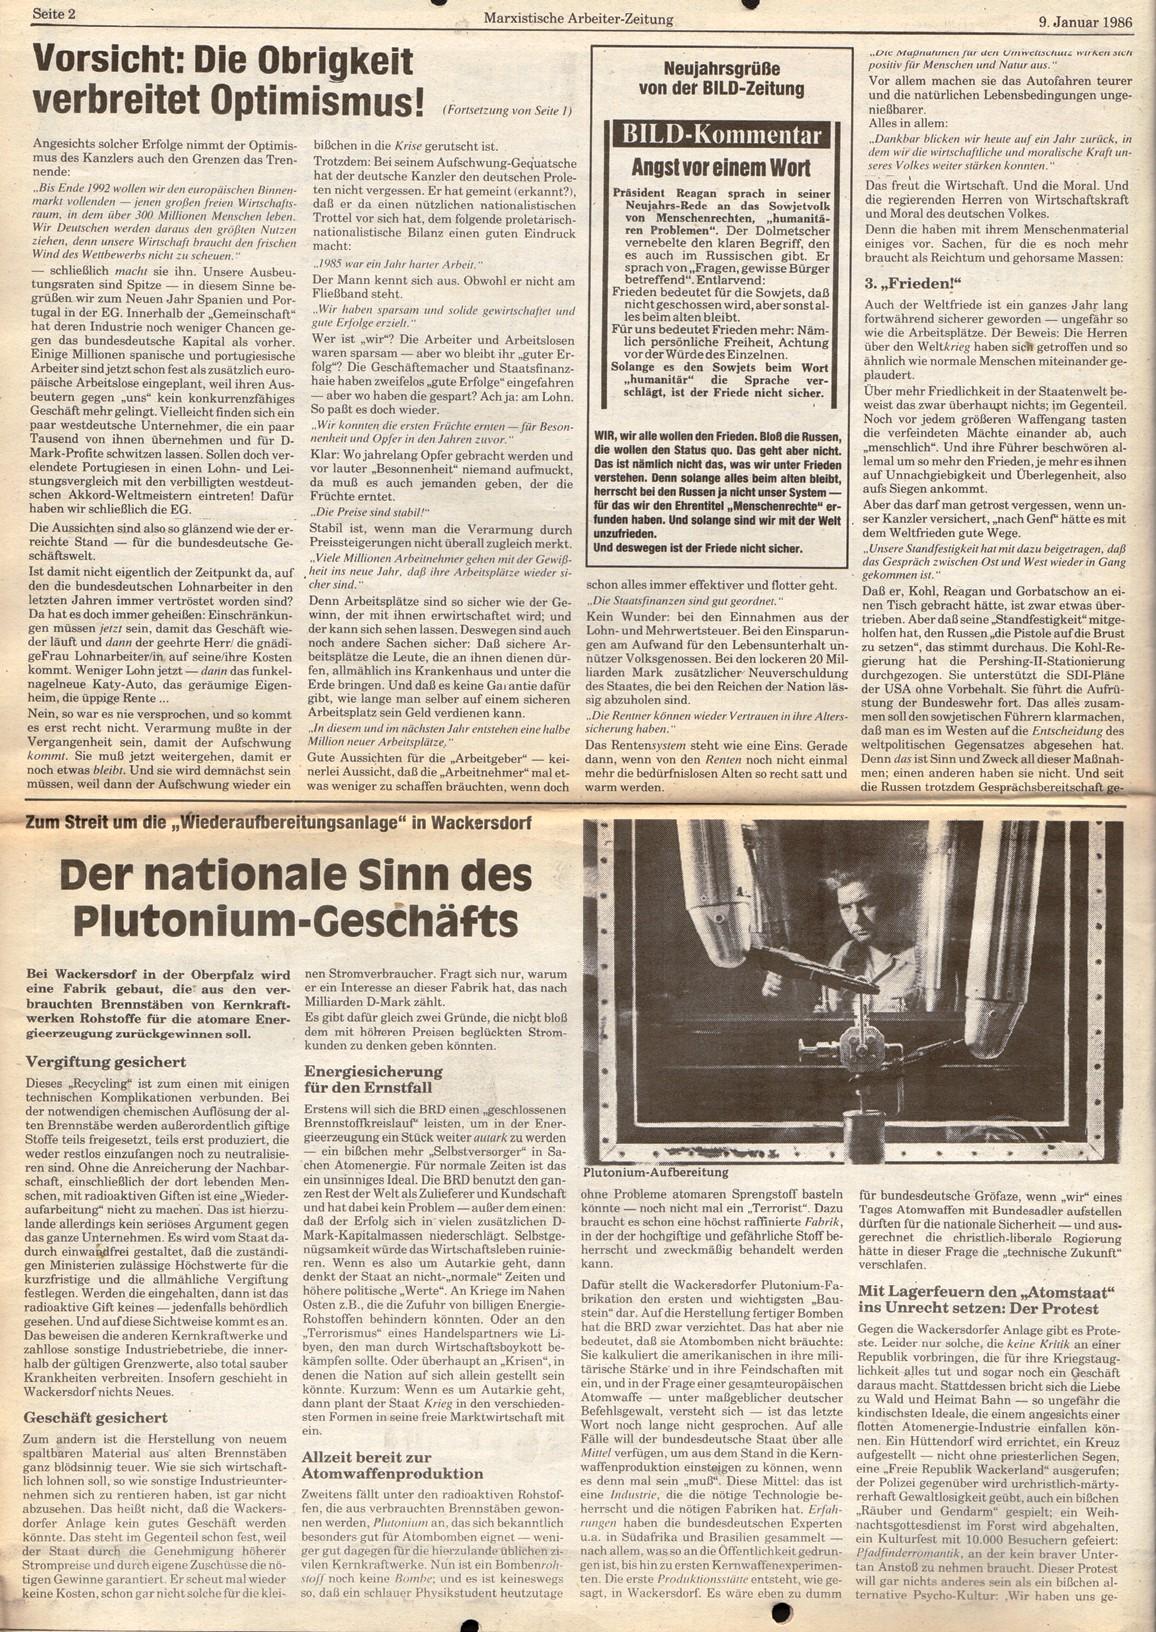 Muenchen_MG_MAZ_Kaufhaus_19860109_02